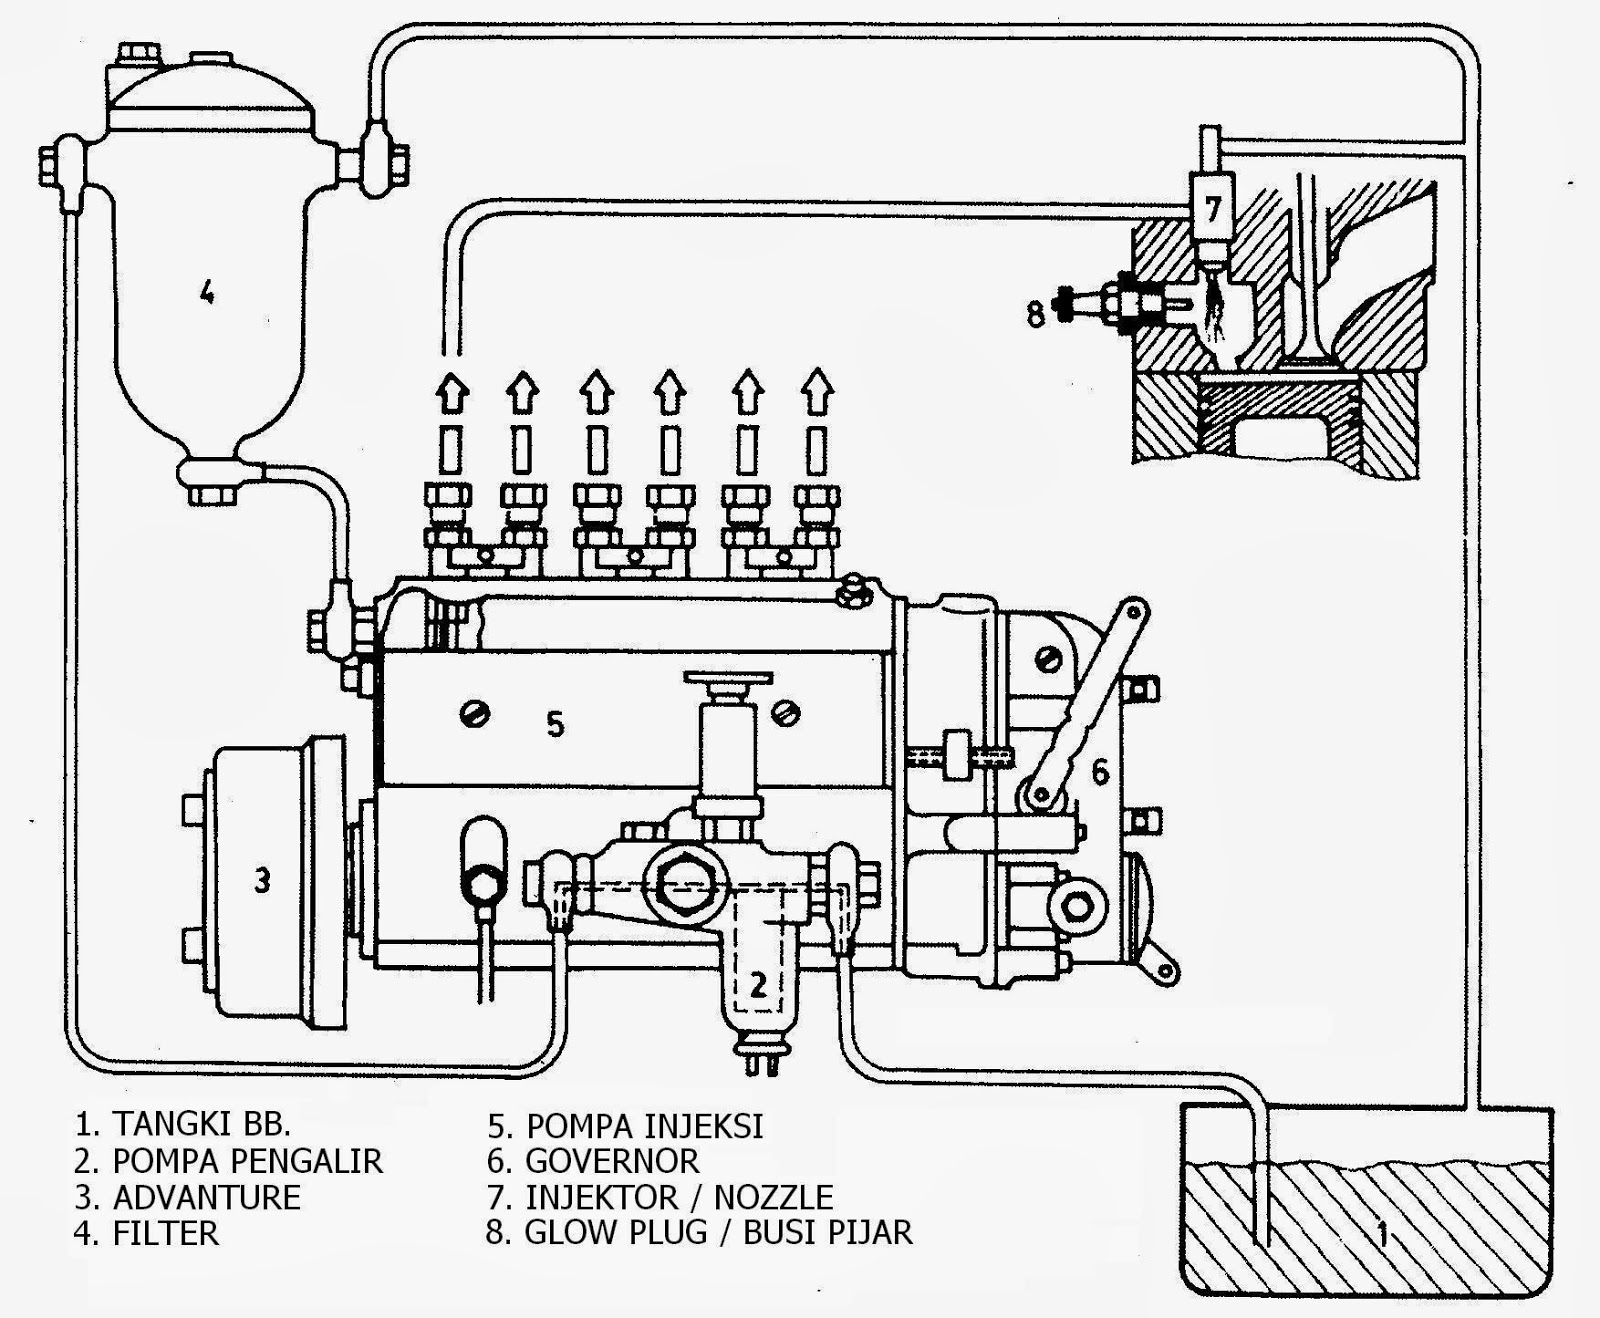 04 Hyundai Elantra Fuse Box Diagram Hyundai Auto Wiring